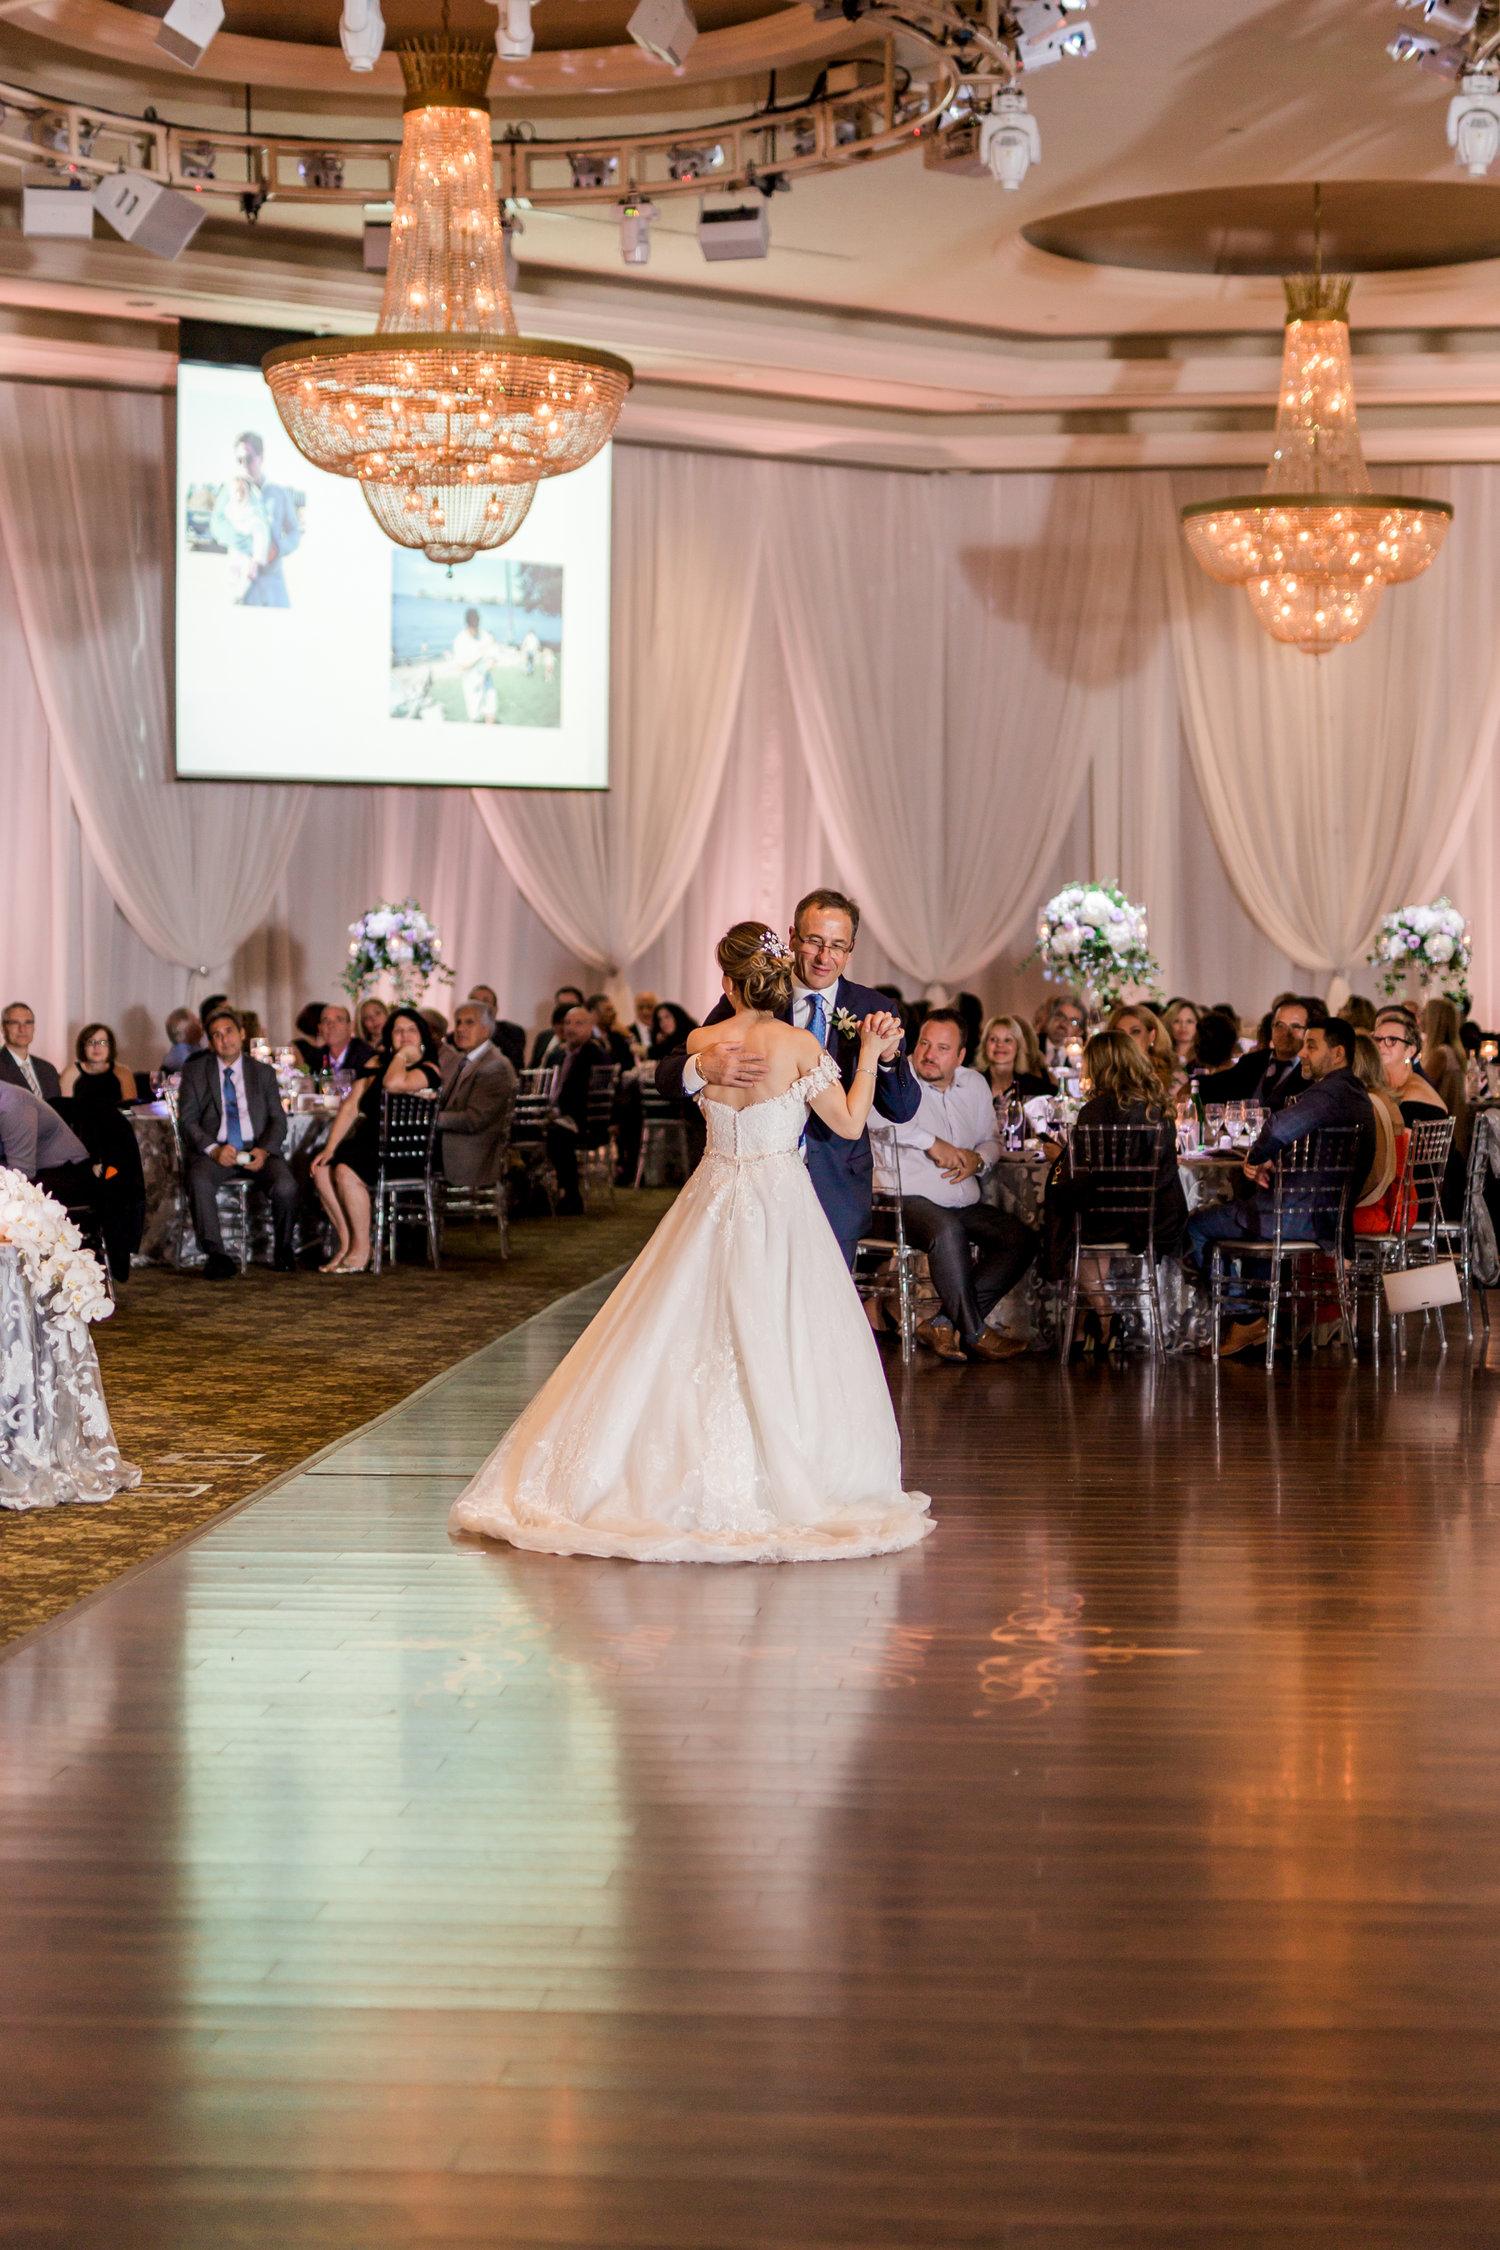 Danielle-Giroux-Amir-Golbazi-Toronto-Wedding-Photographer-Bellvue-Manor_DeLuca_2-695.jpg